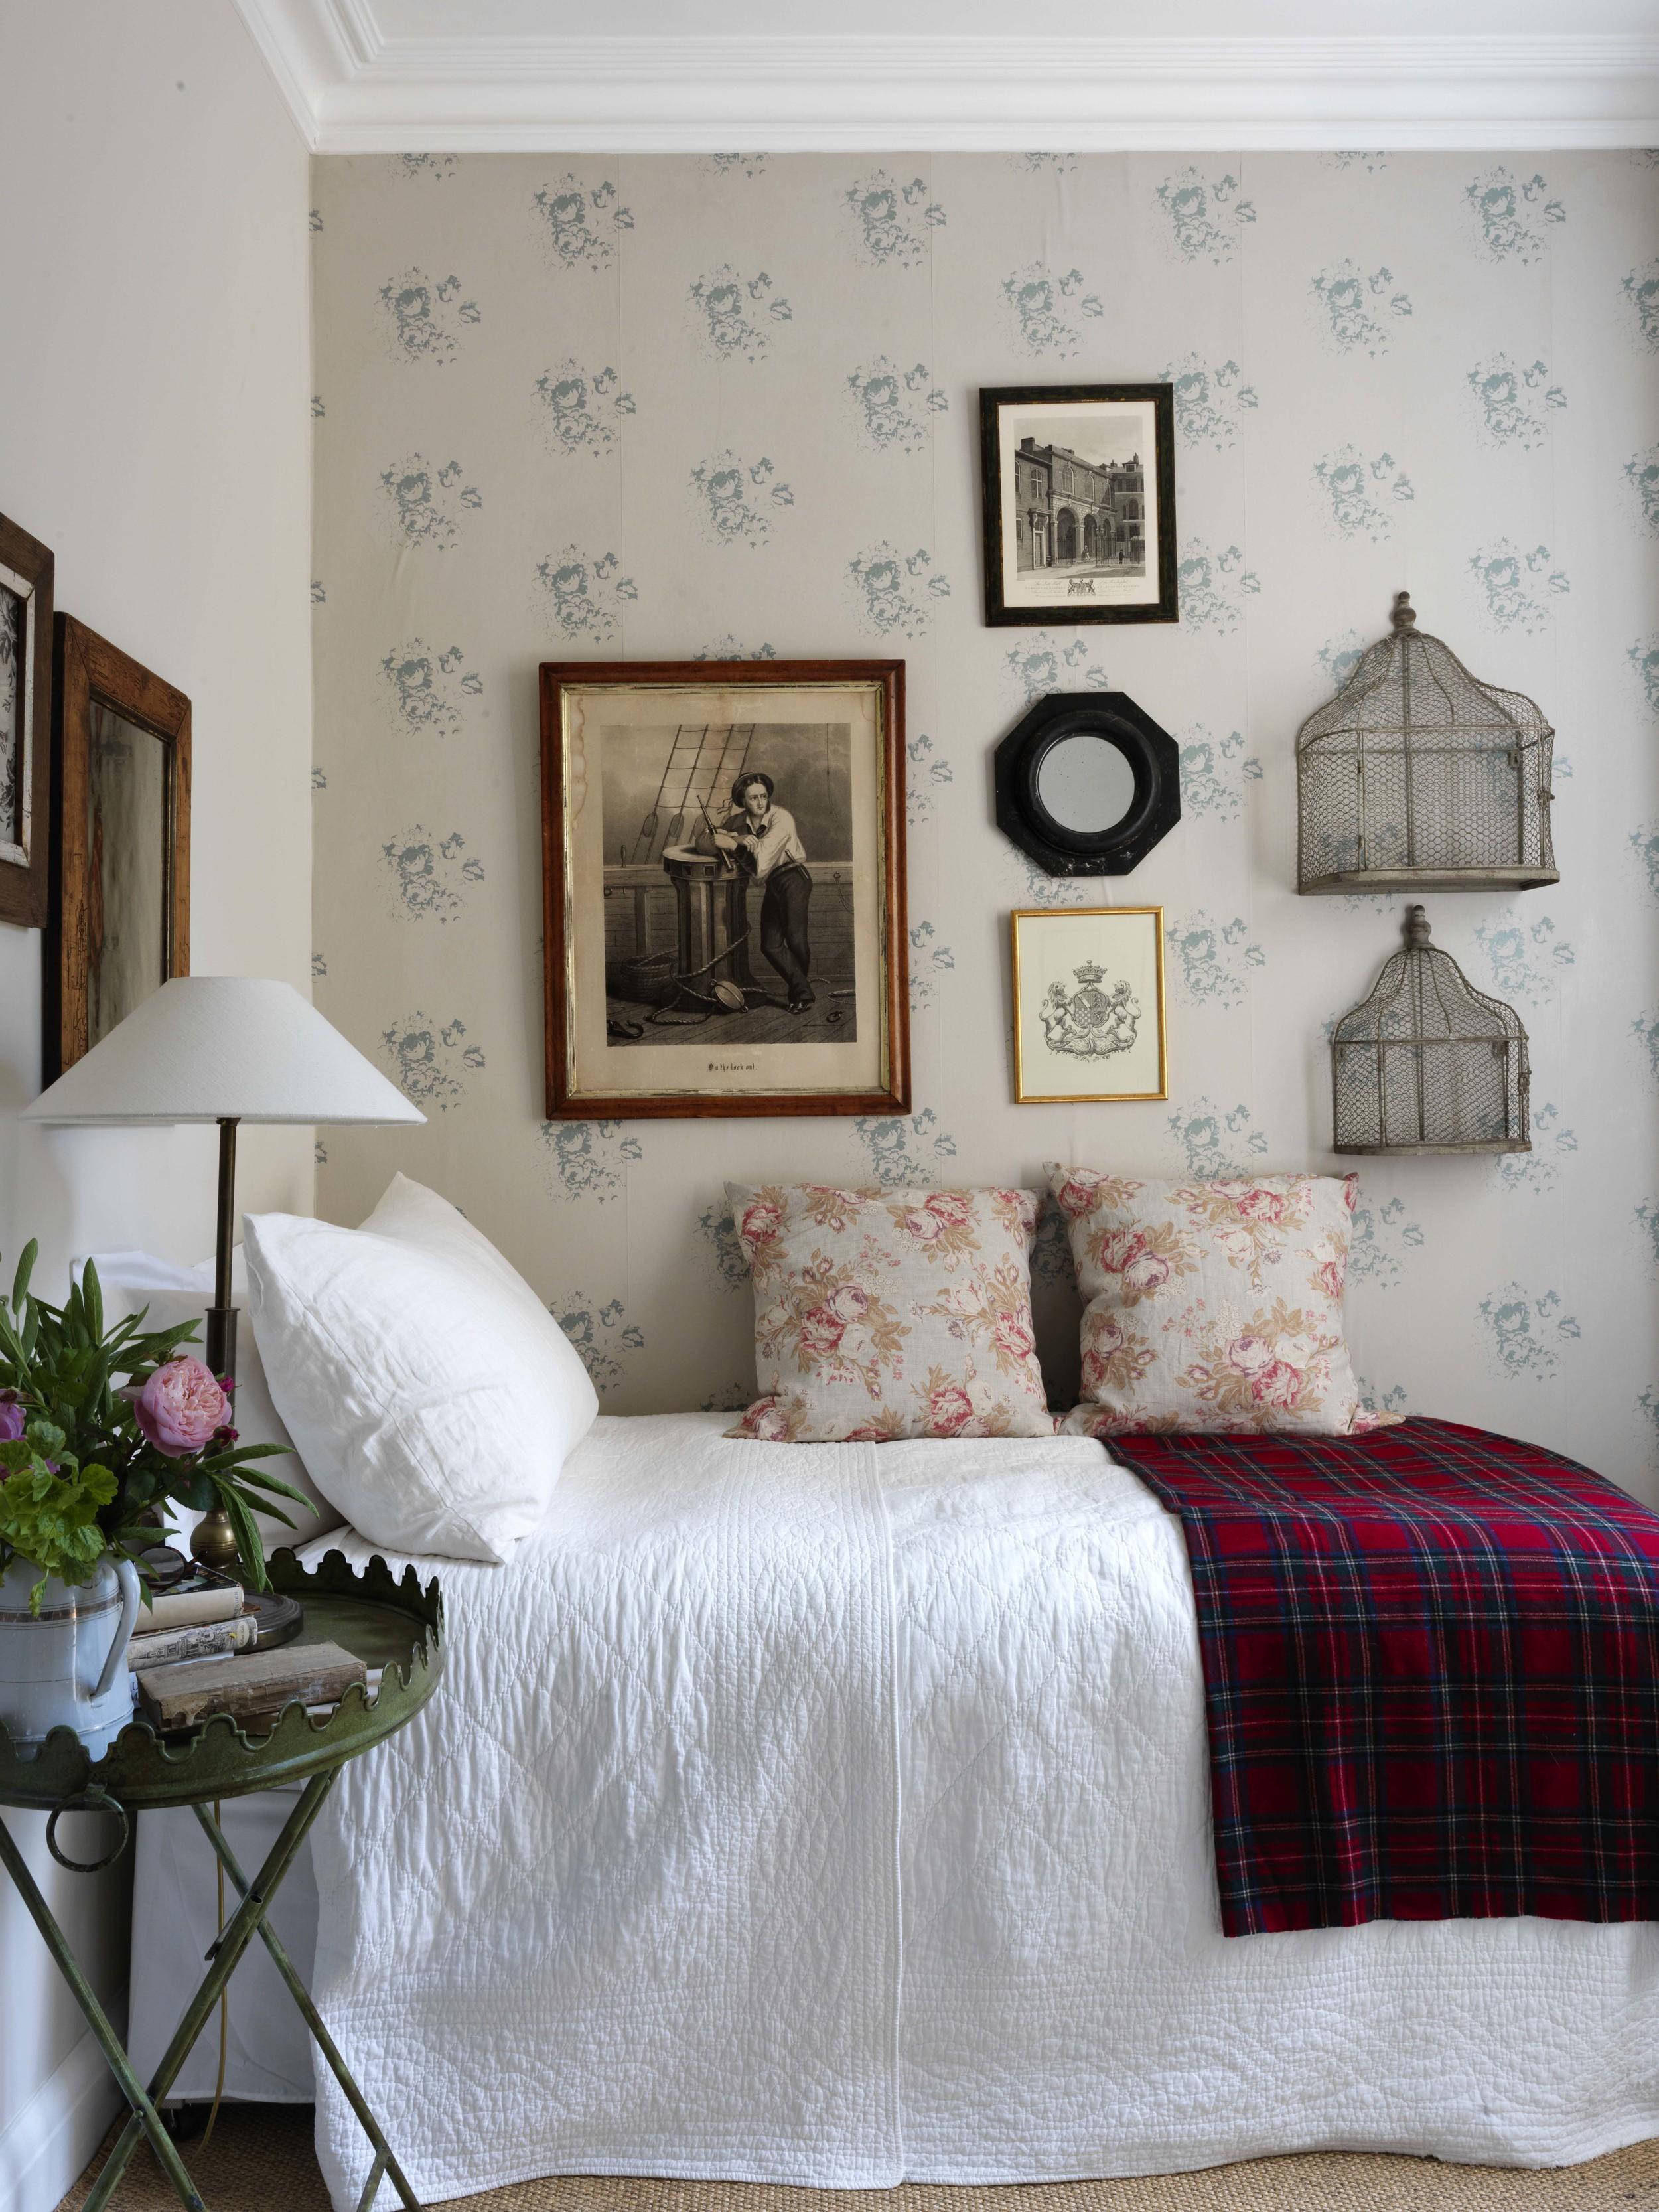 Natural Hatley Blue Wallpaper,Price - £28 per metre